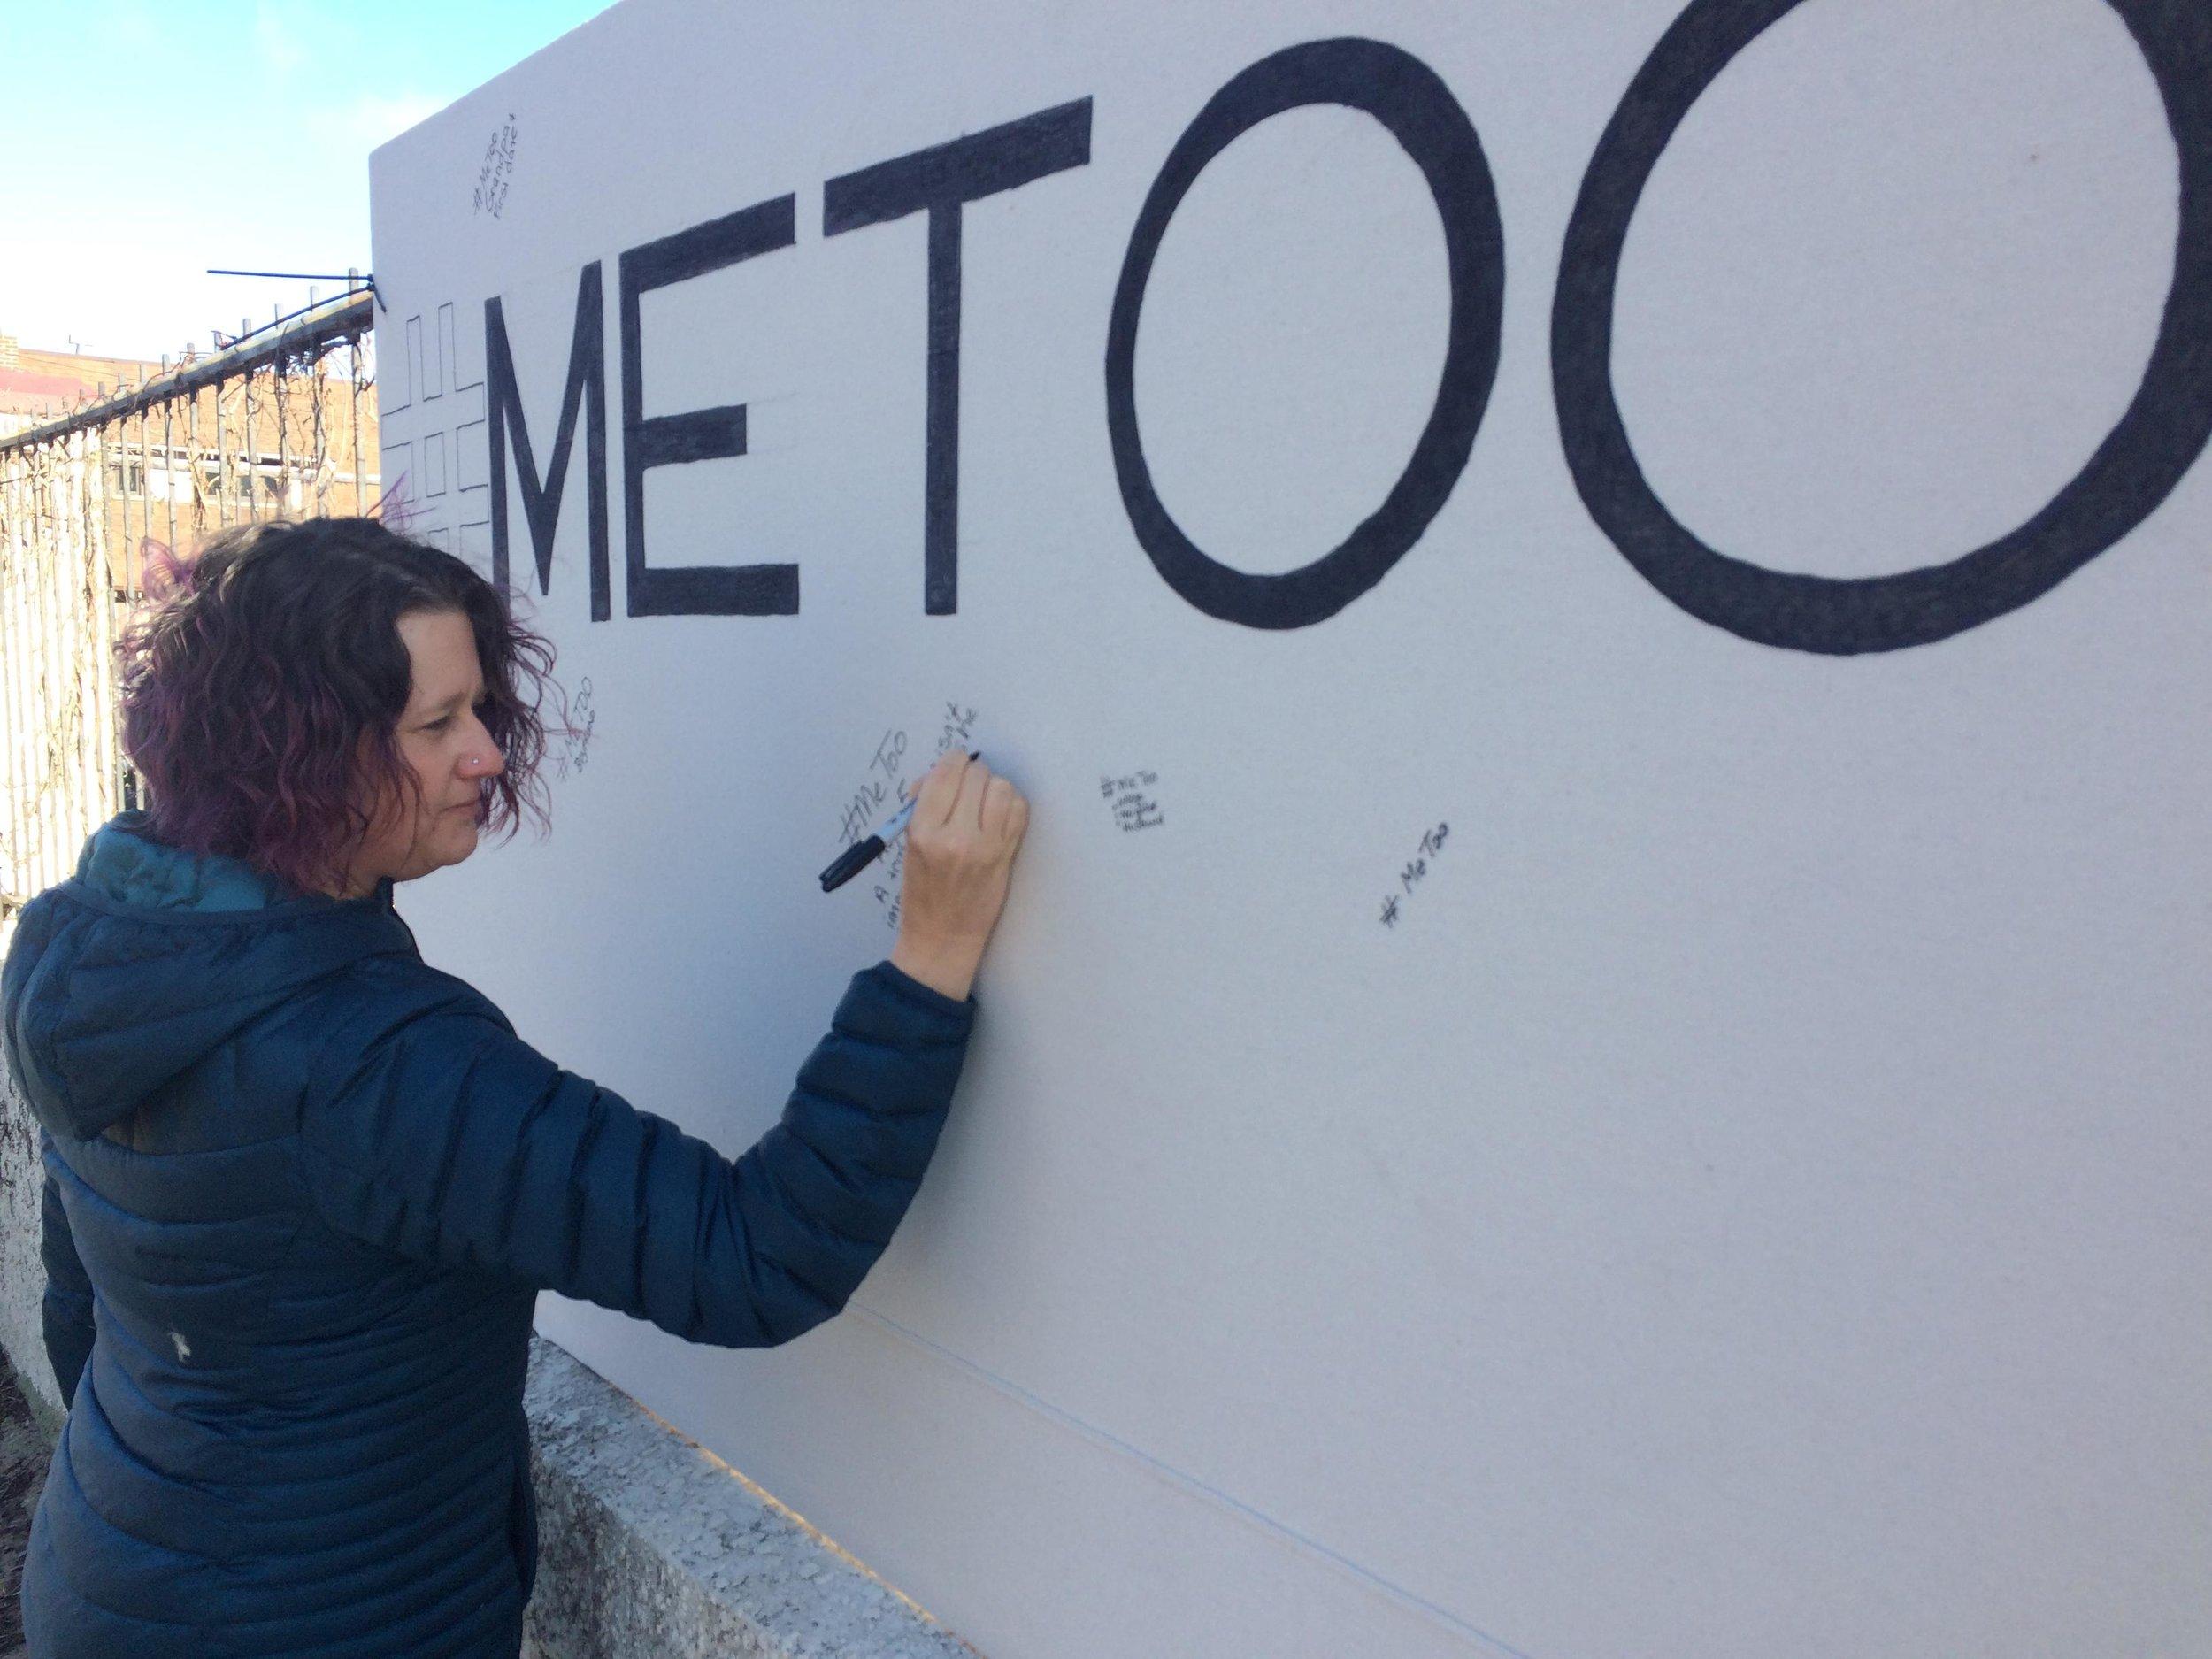 Metoo - Dispatch 2.jpg